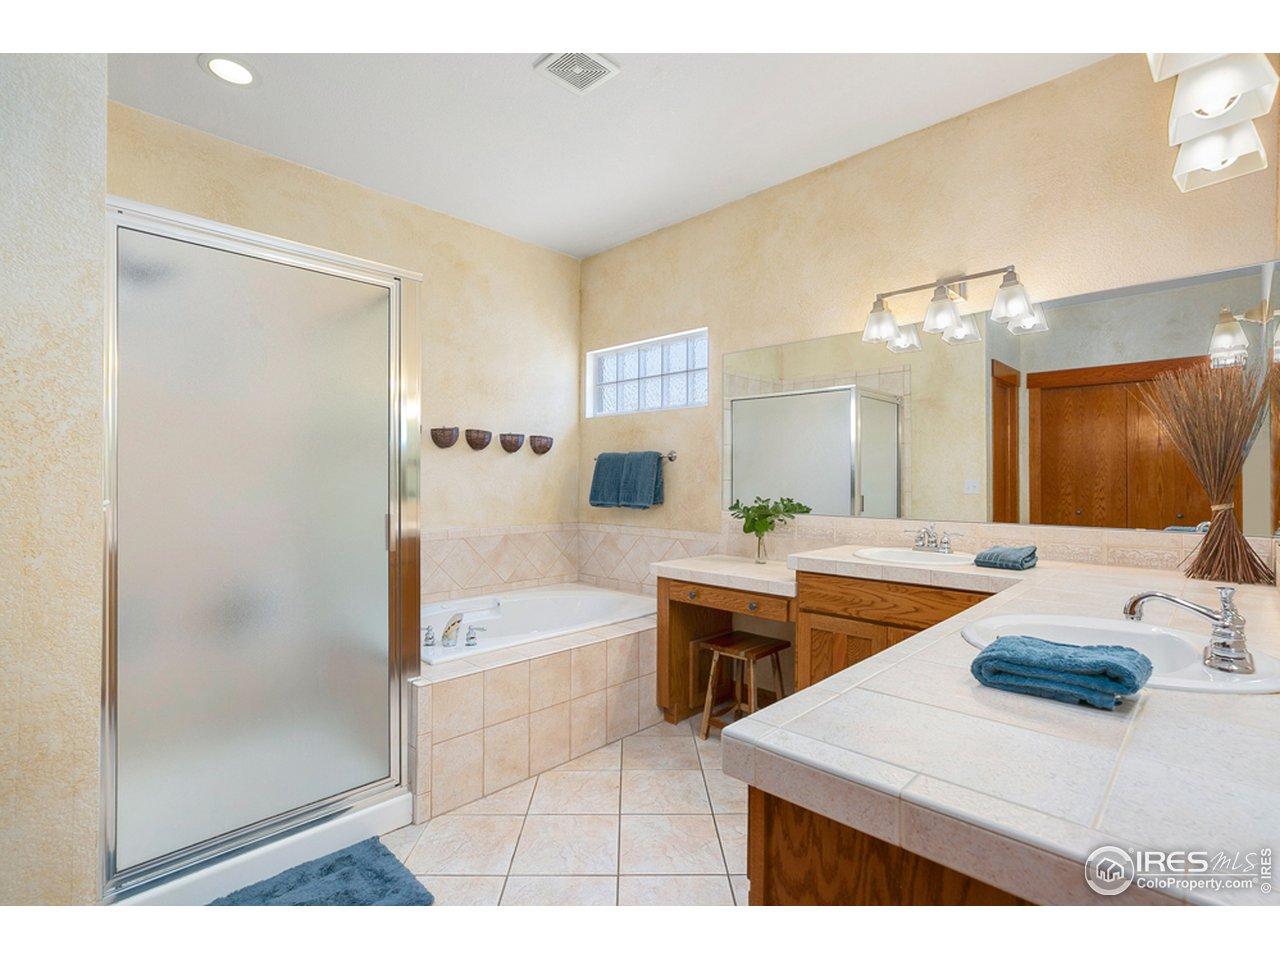 Great sized master bathroom w/huge linen closet on adjacent wall